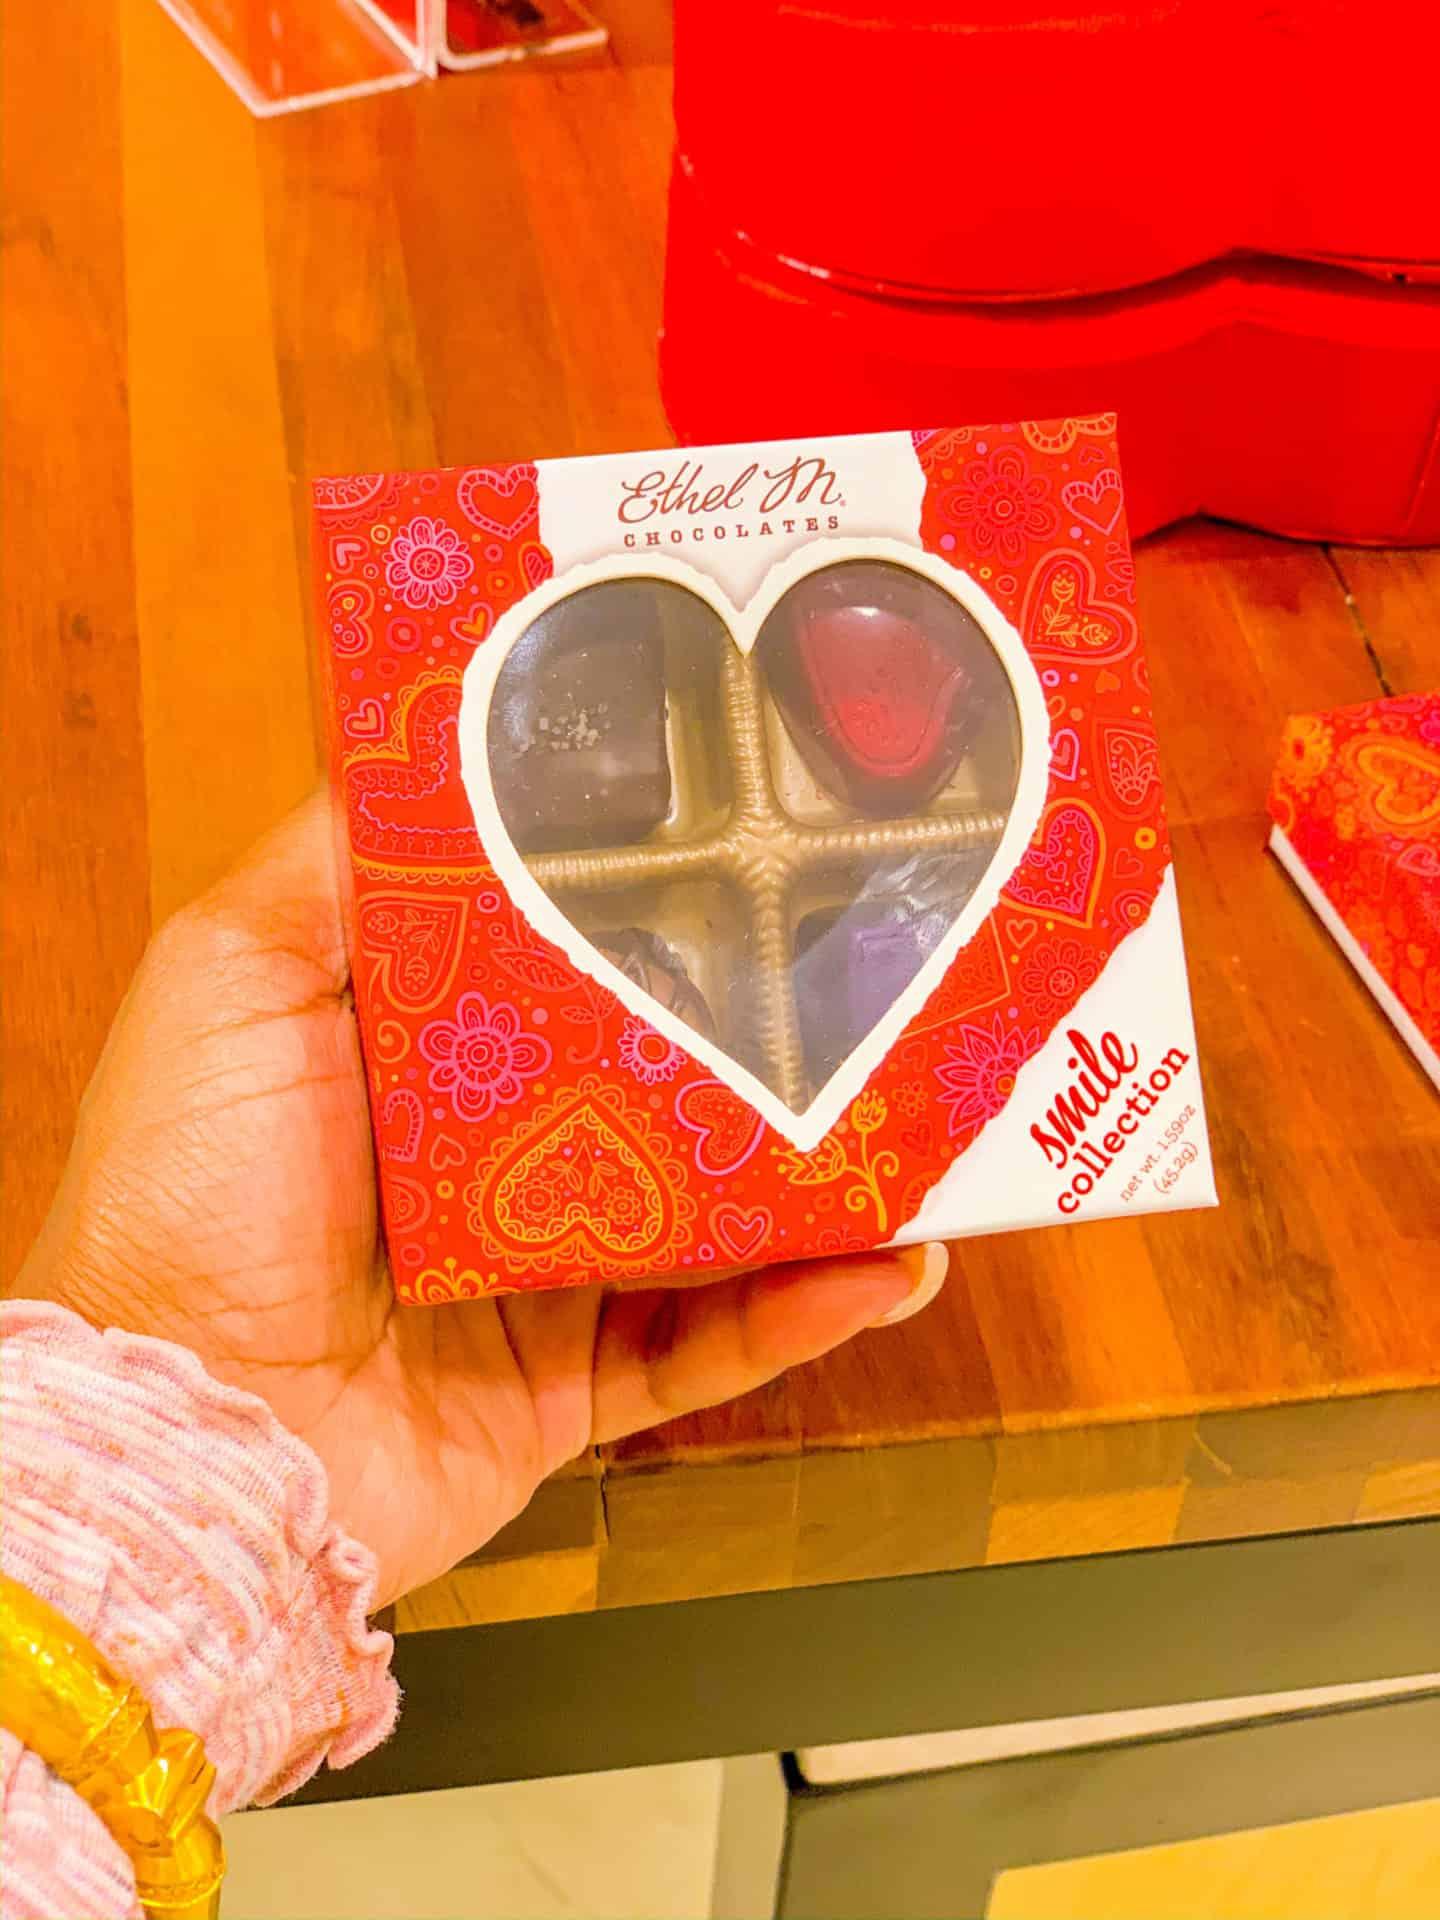 Ethel M Chocolates Smile Collection